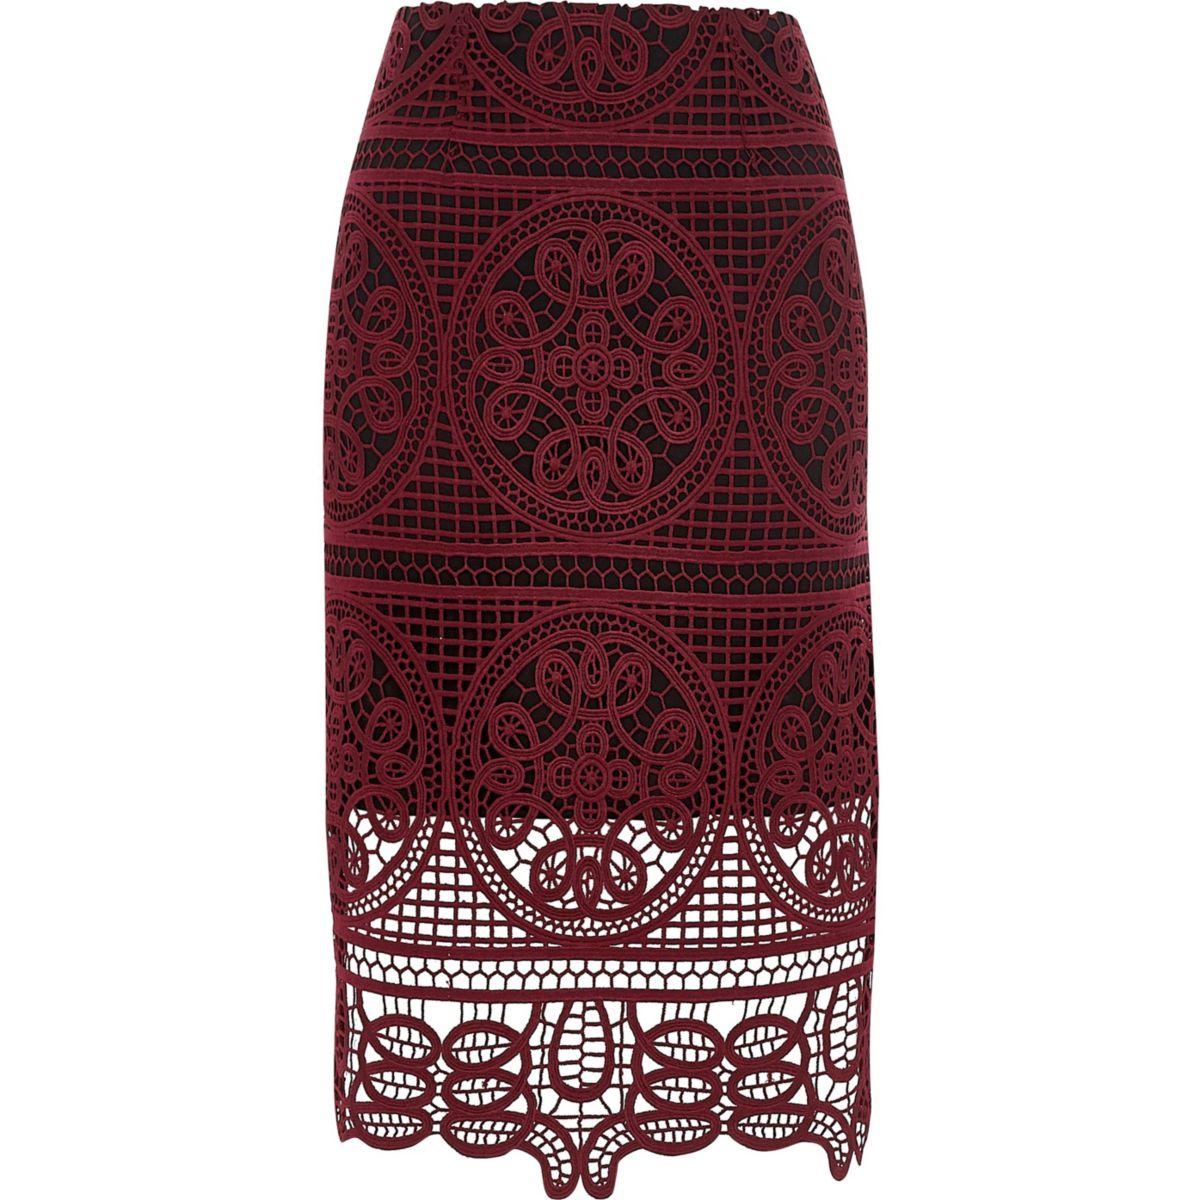 Dark red geo lace pencil skirt